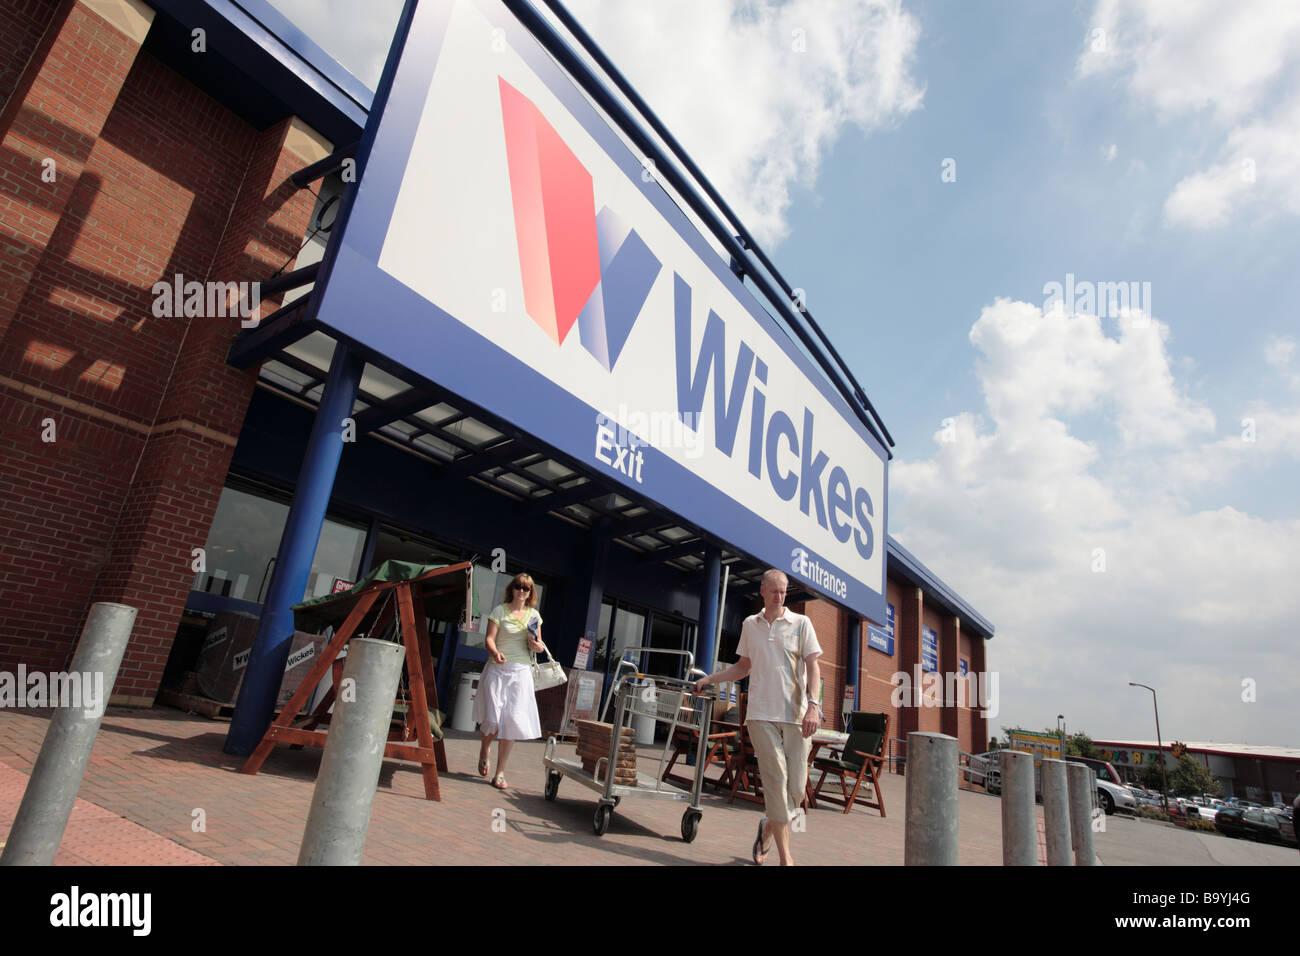 Wickes store, Albion Mills Retail Park, Wakefield - Stock Image